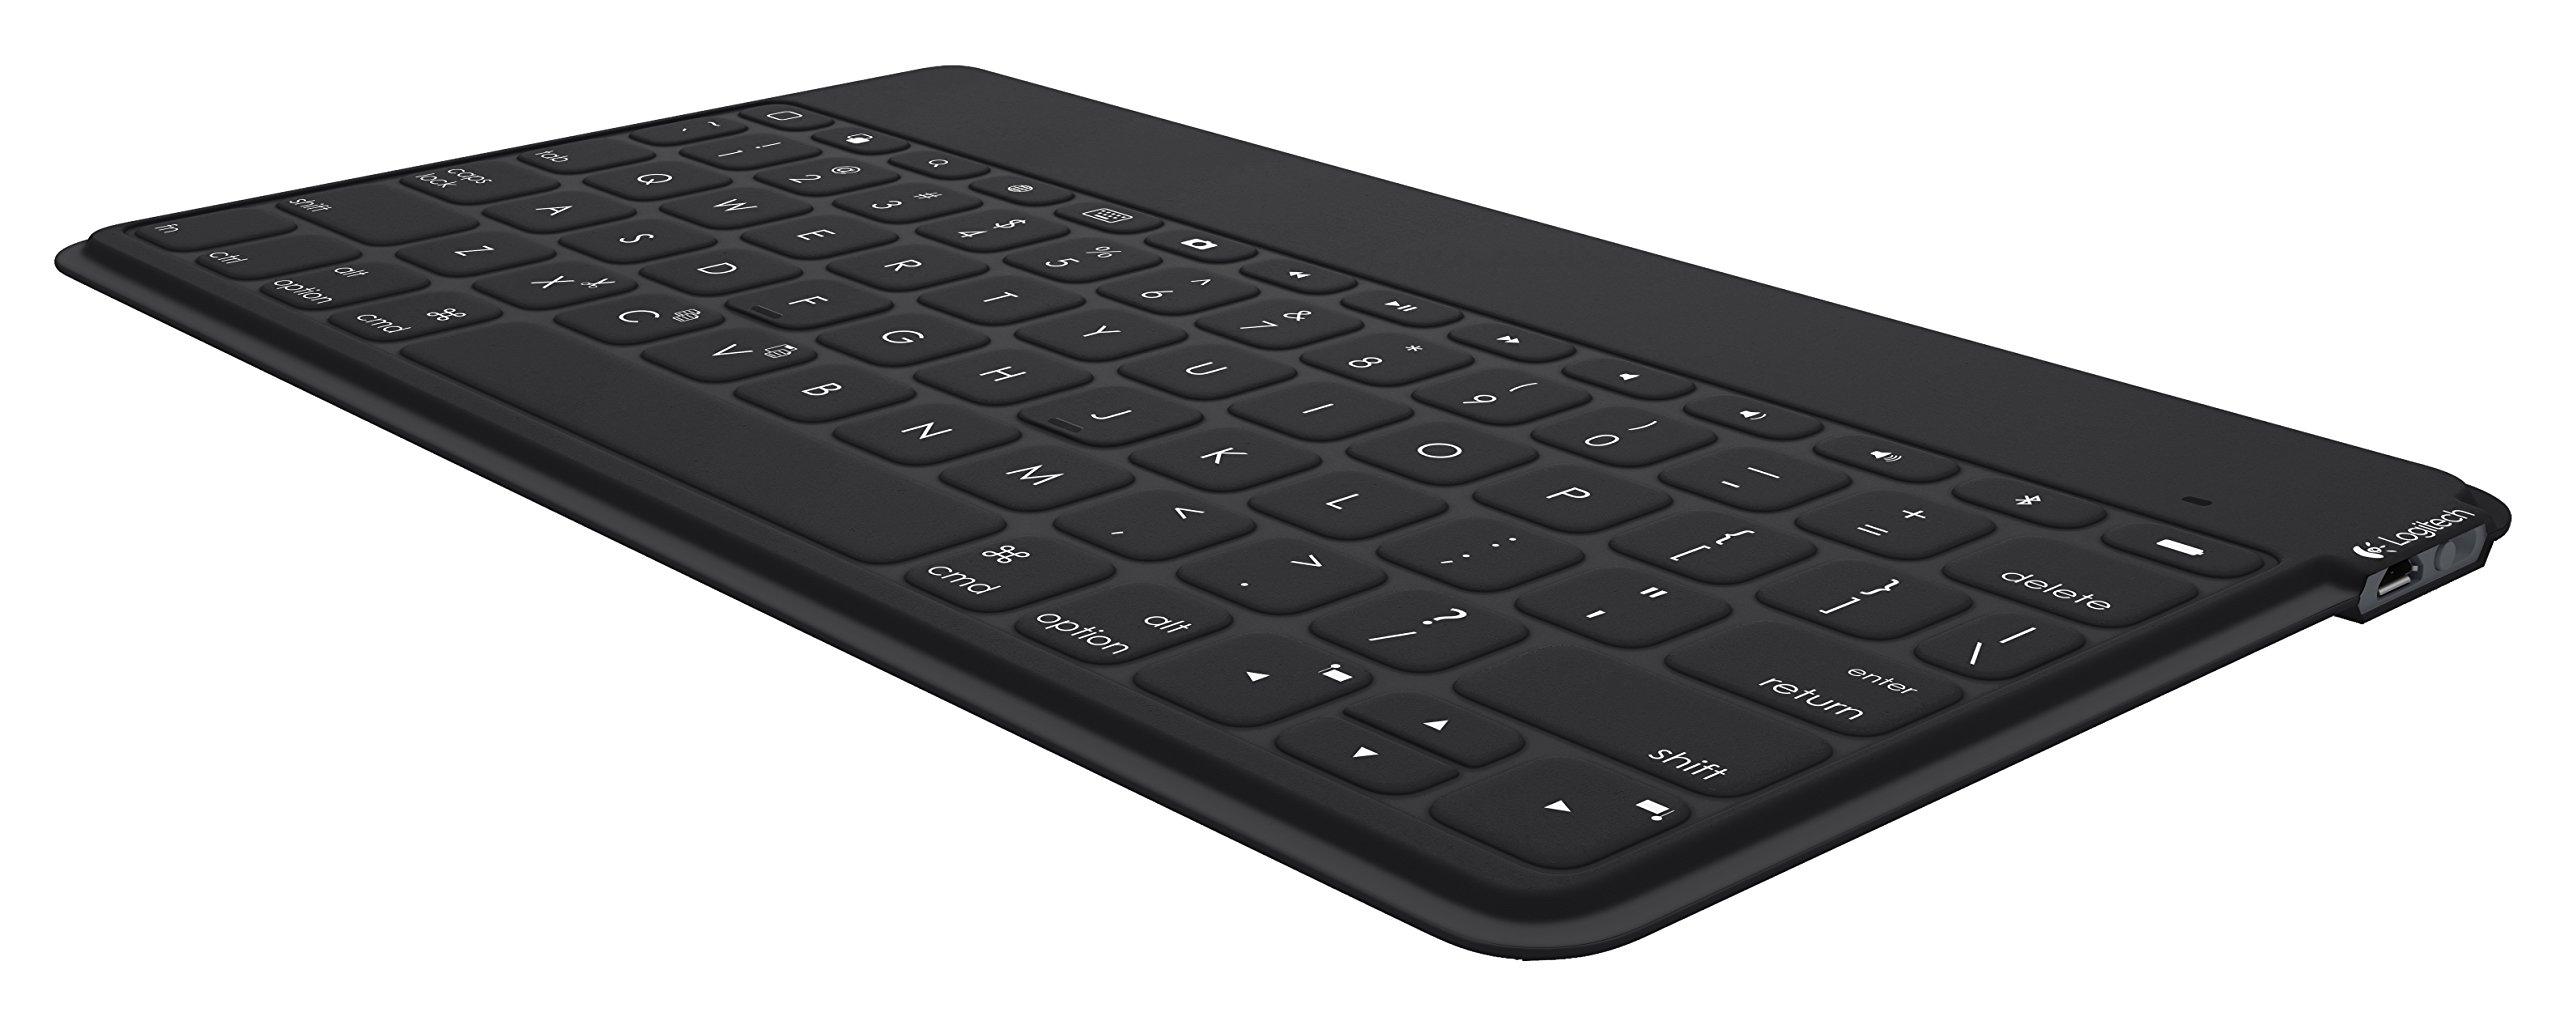 LOG920006701 - LOGITECH, INC. Logitech Keys-to-Go Ultra-Portable, Stand-Alone Keyboard by Logitech (Image #3)